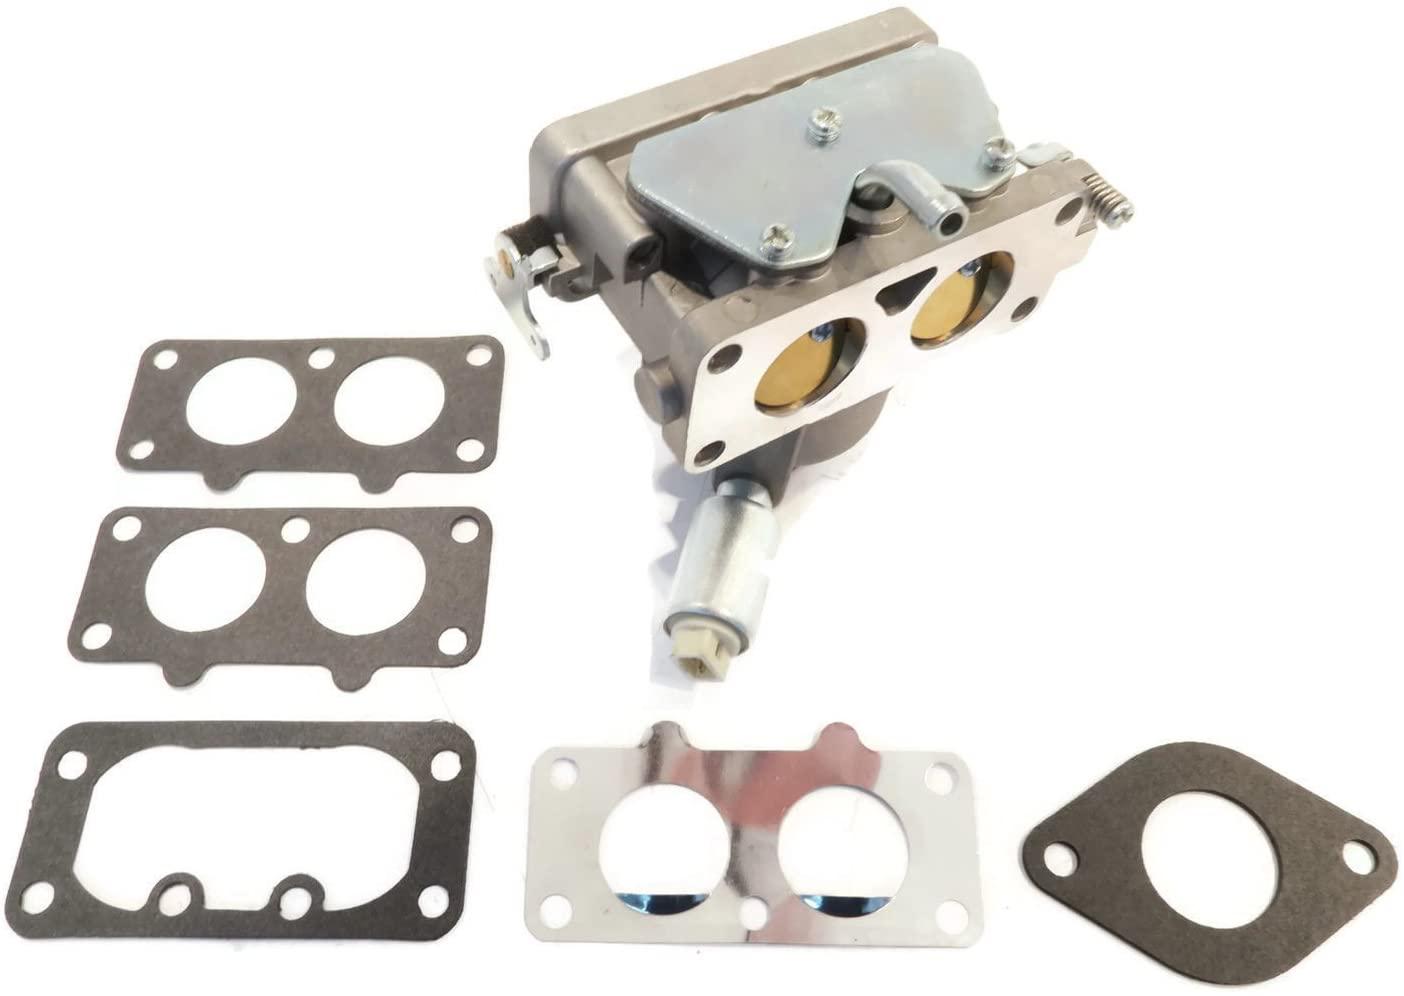 The ROP Shop Carburetor CARB fits Briggs & Stratton 44P777 44Q777 44R577 44R677 Mower Engines